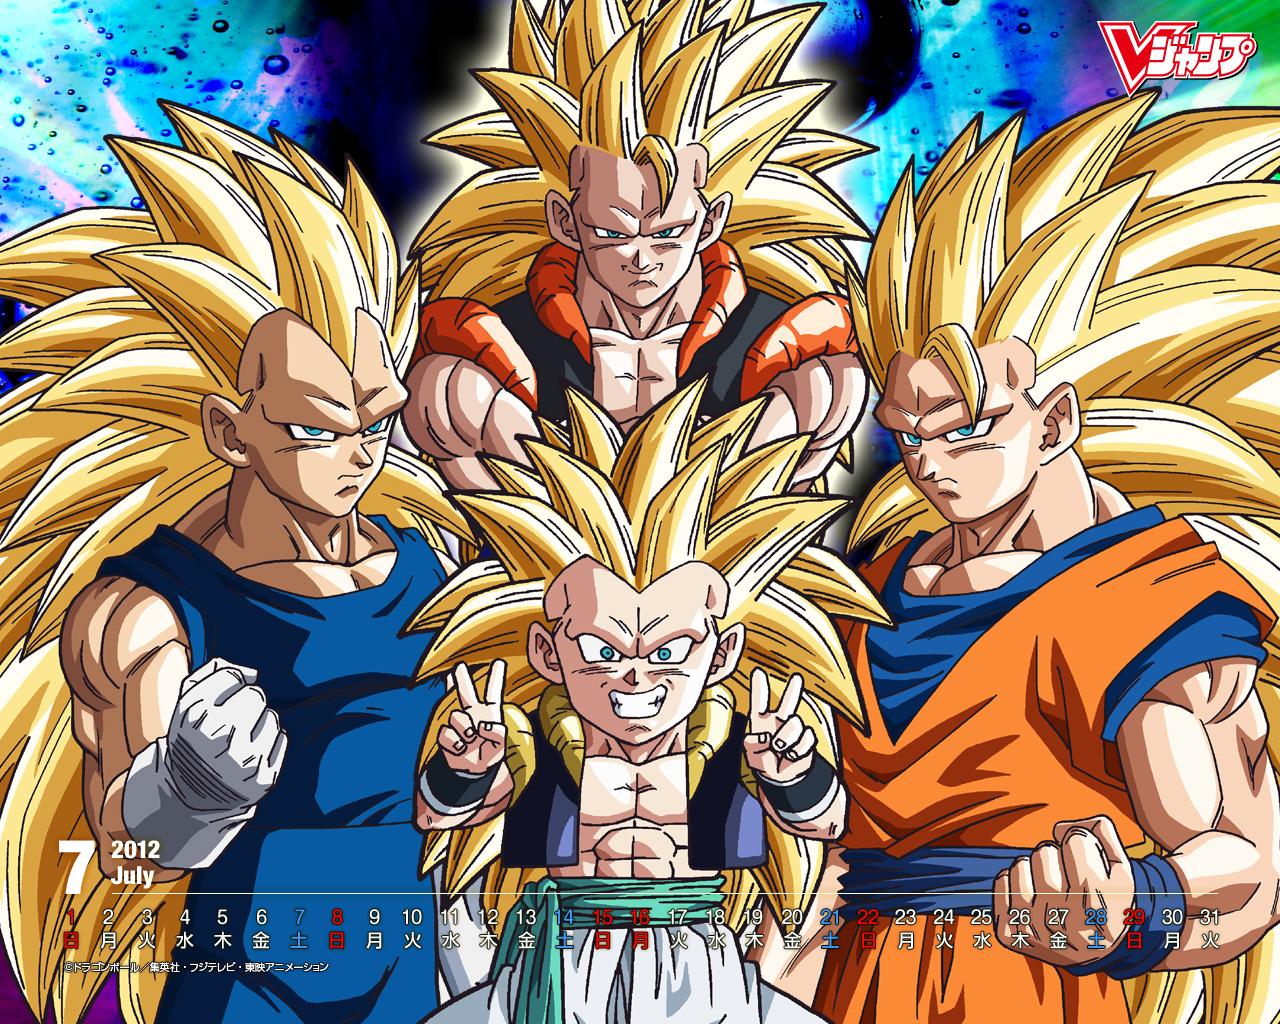 Imagenesde99 Imagenes De Goku Fase 10 Para Descargar: Imagenesde99: Imagenes De Dragon Ball Z Goku Fase 1000